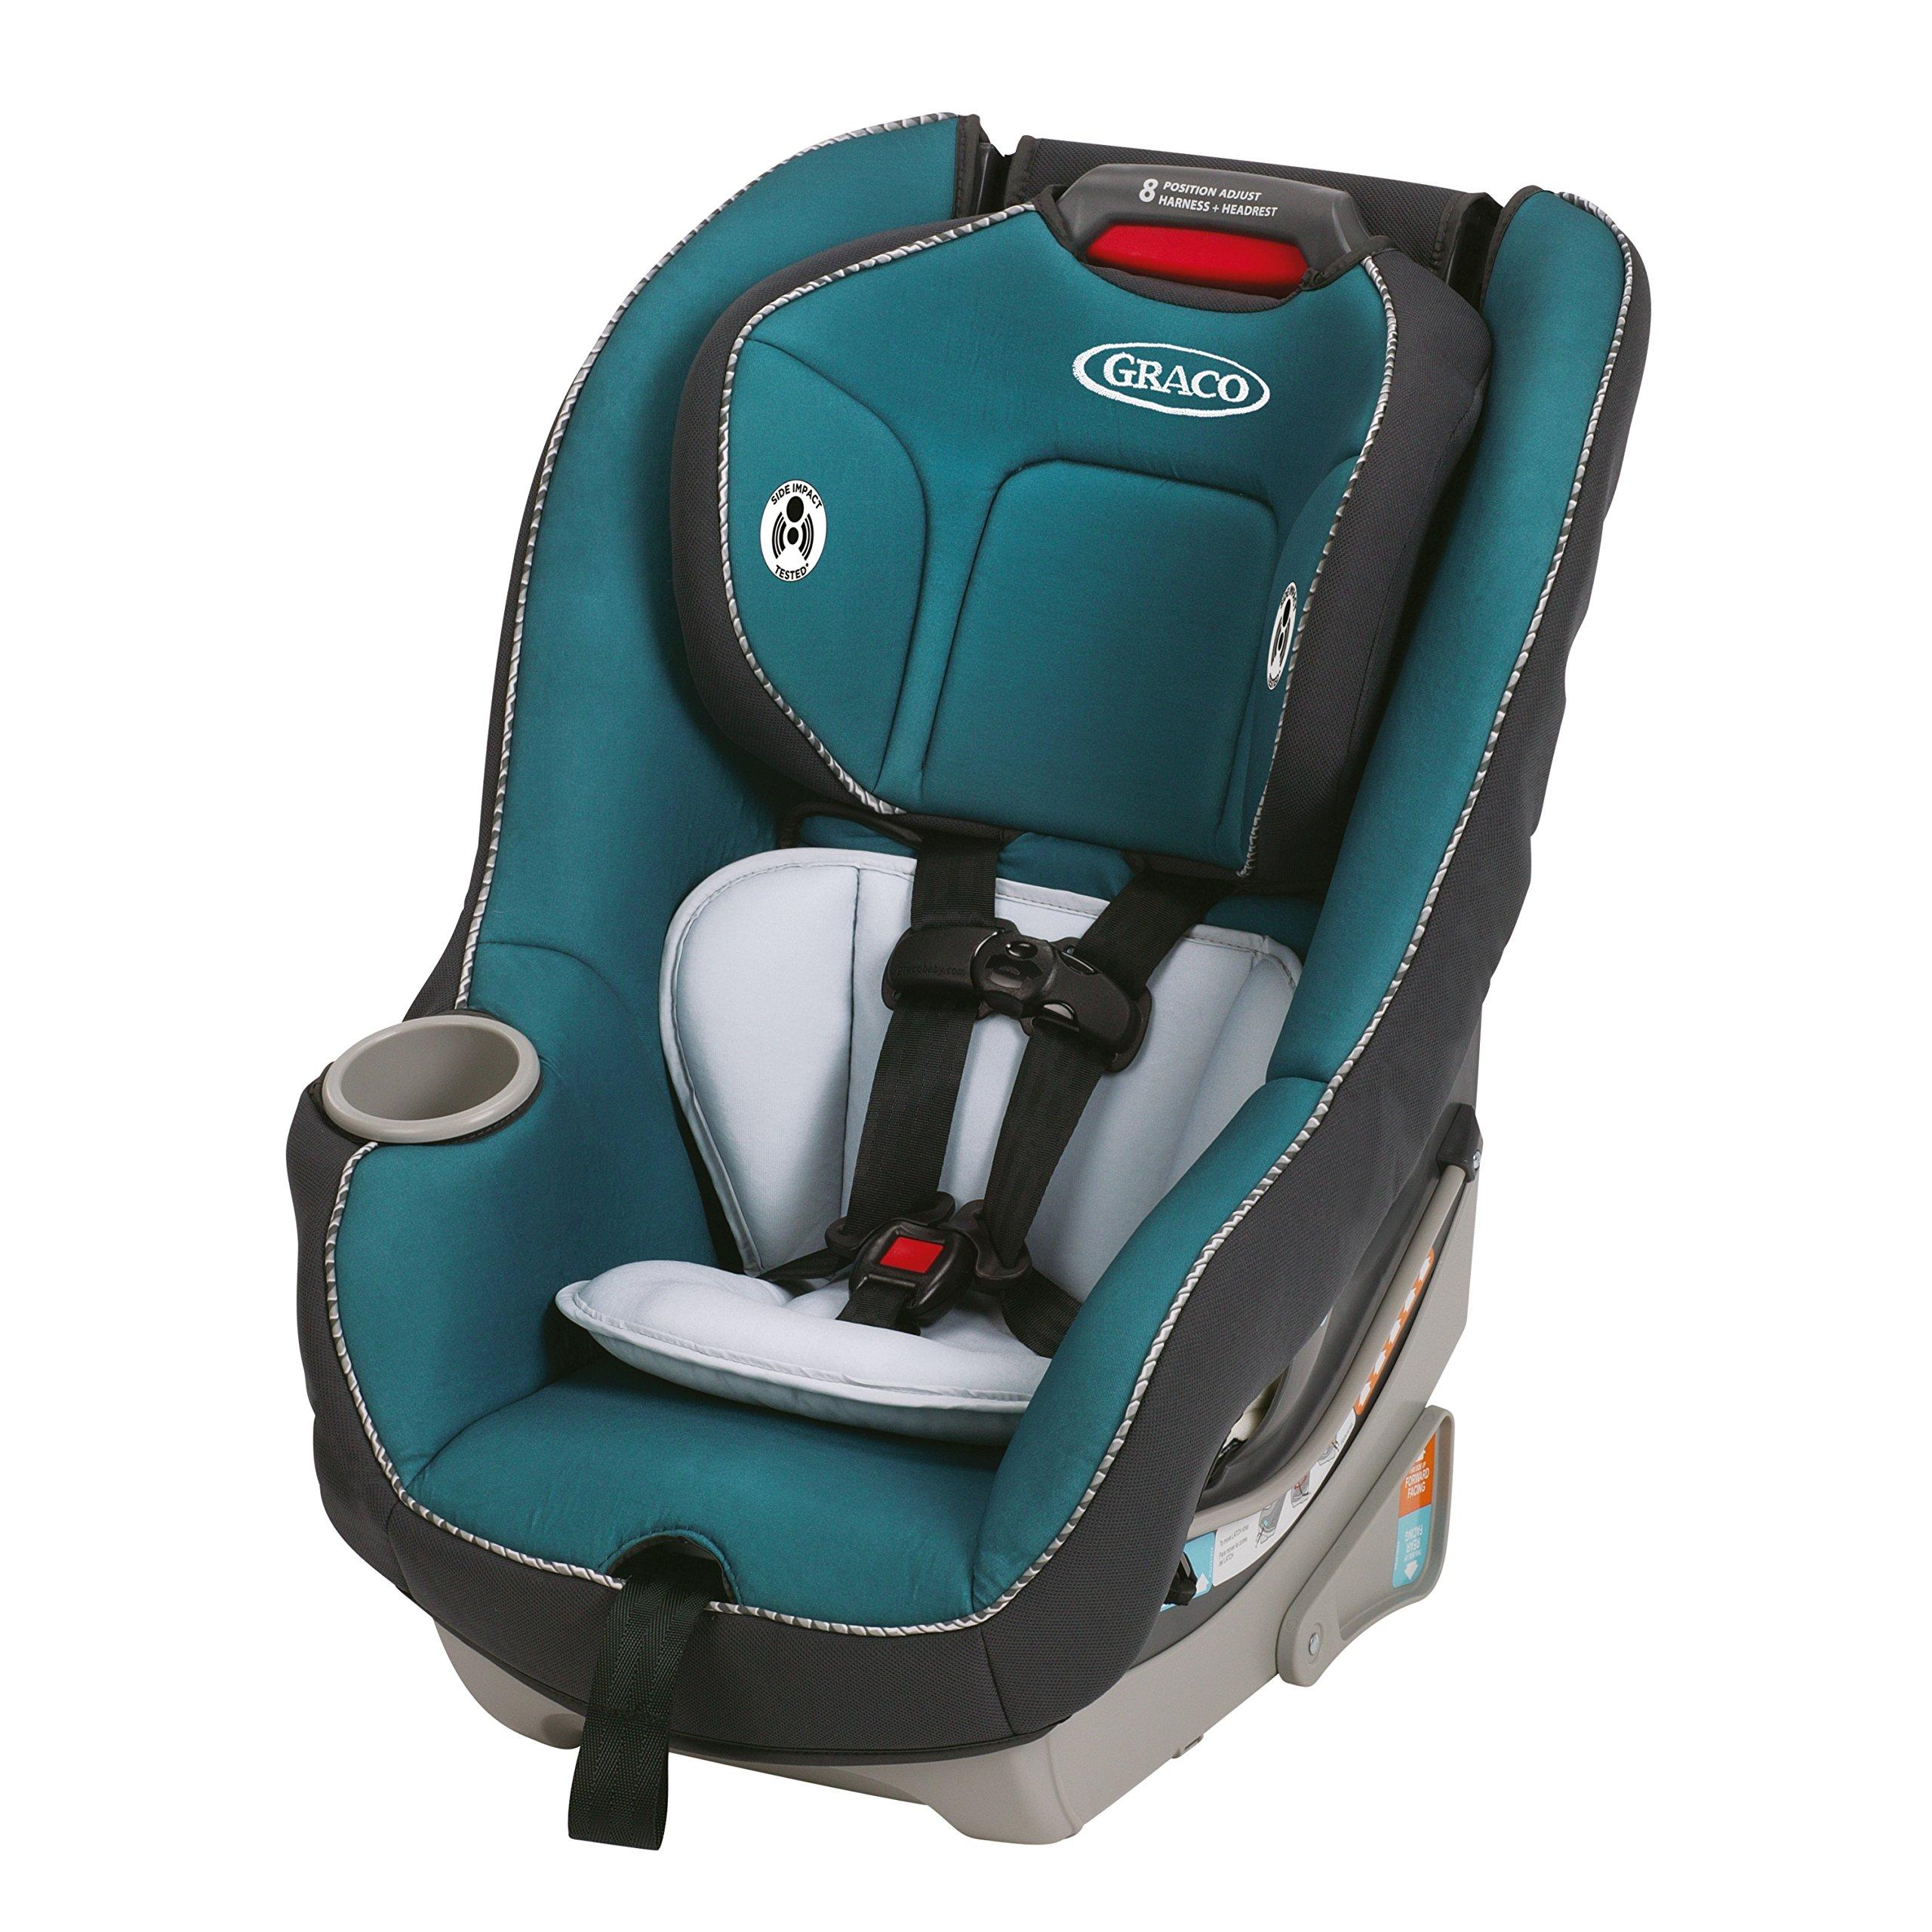 Graco Contender 65 Convertible Car Seat, Sapphire